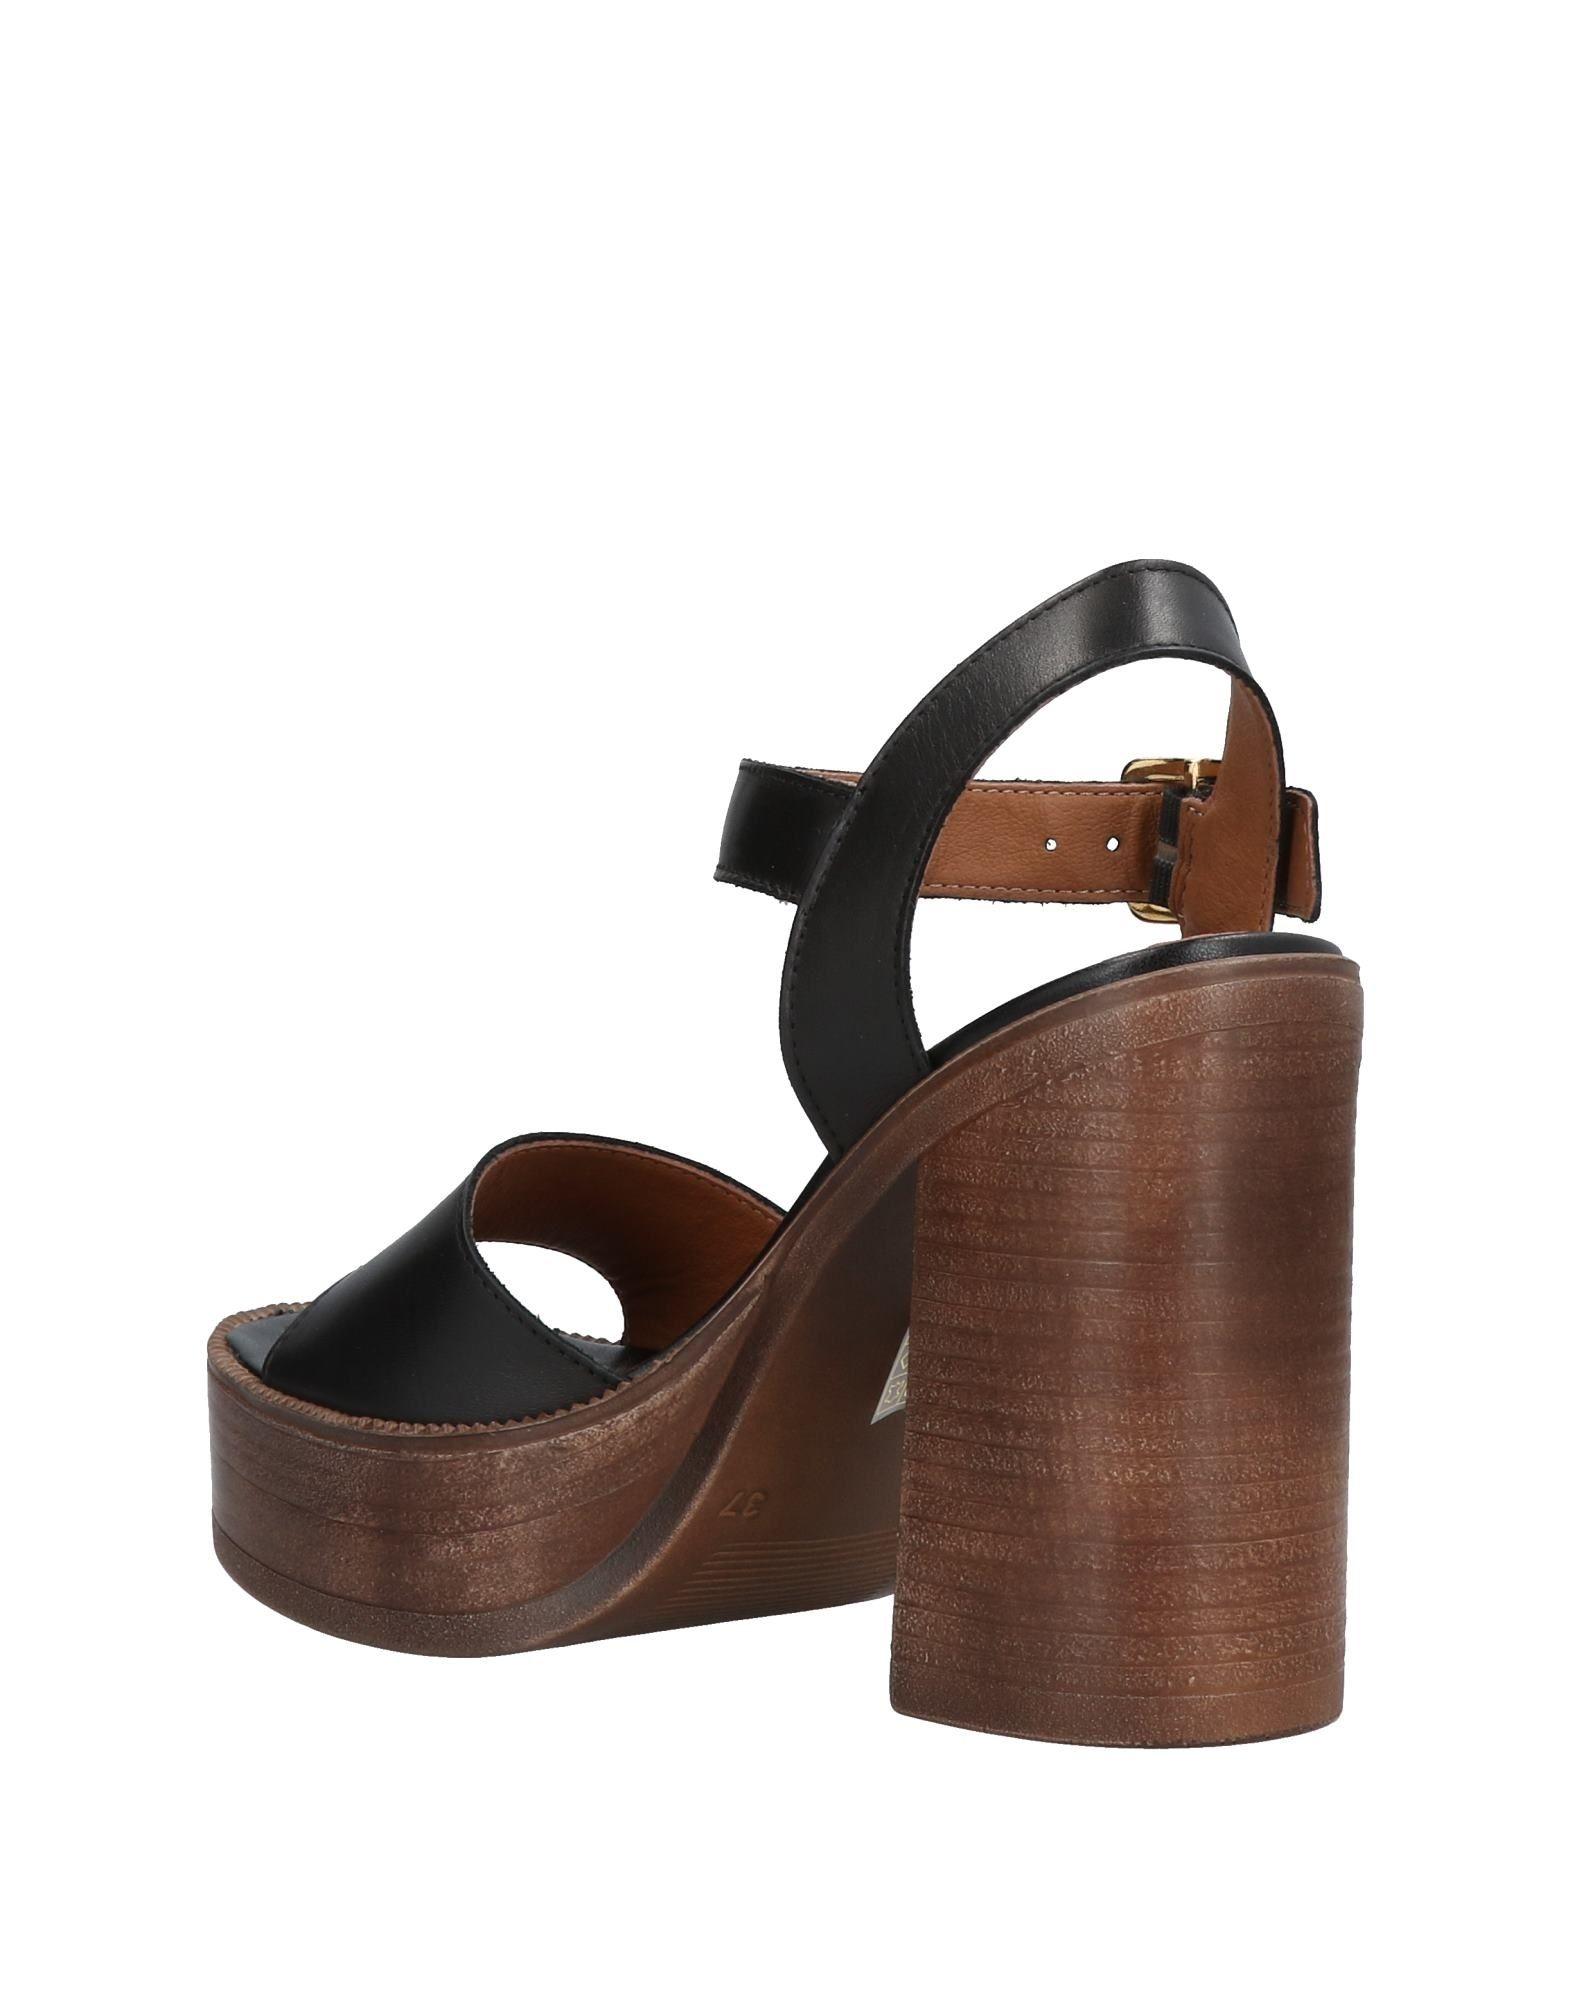 Moda Sandali Gusto Donna - 11427412PW